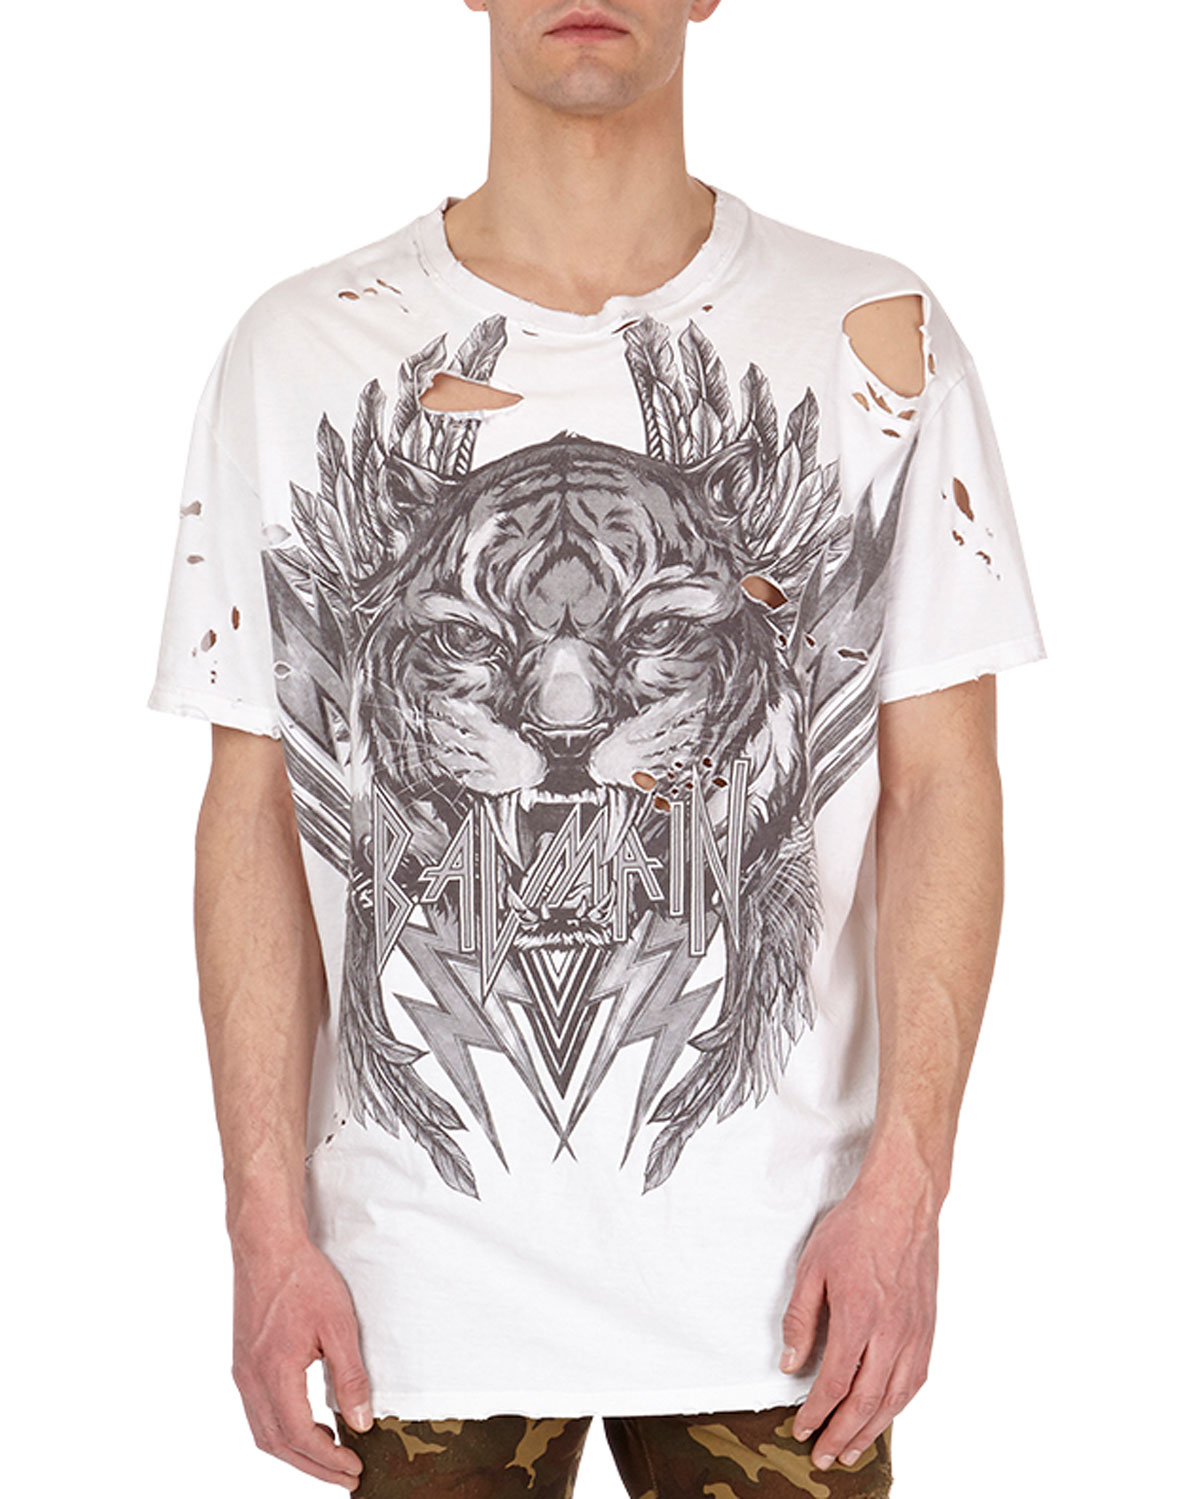 88881658 Balmain Distressed Tiger Head Logo T-Shirt, White | Neiman Marcus